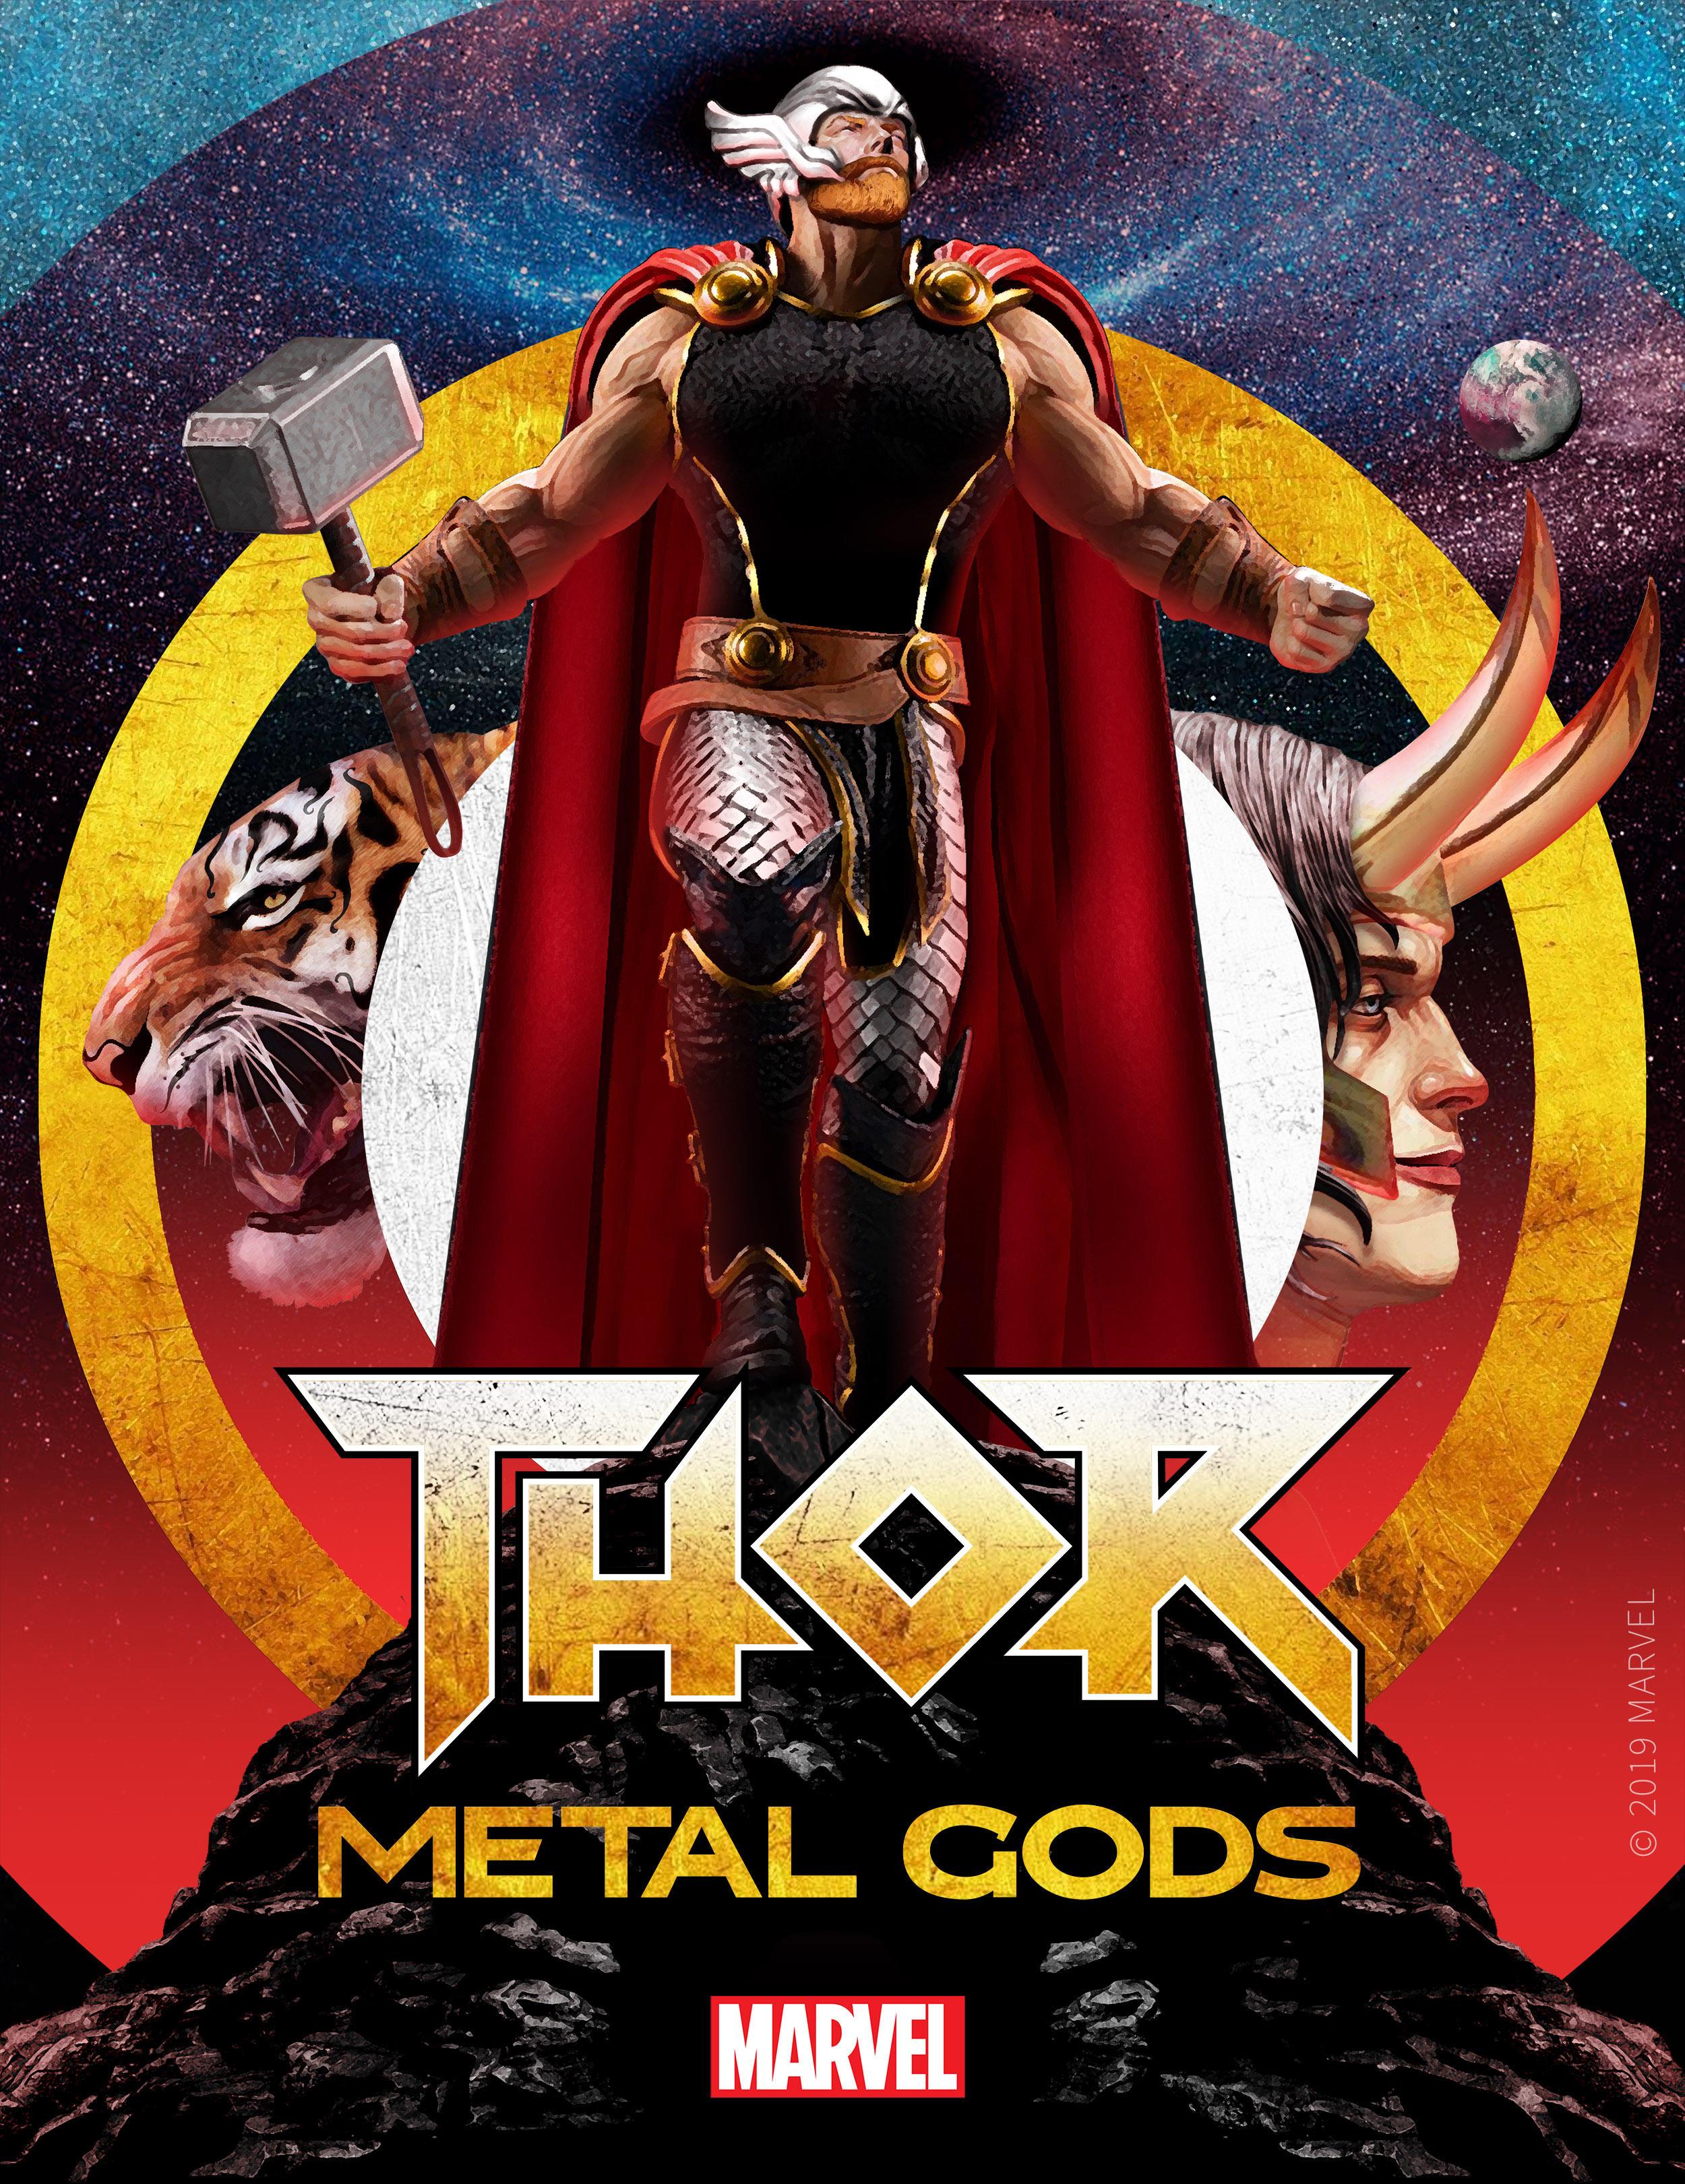 Thor: Metal Gods